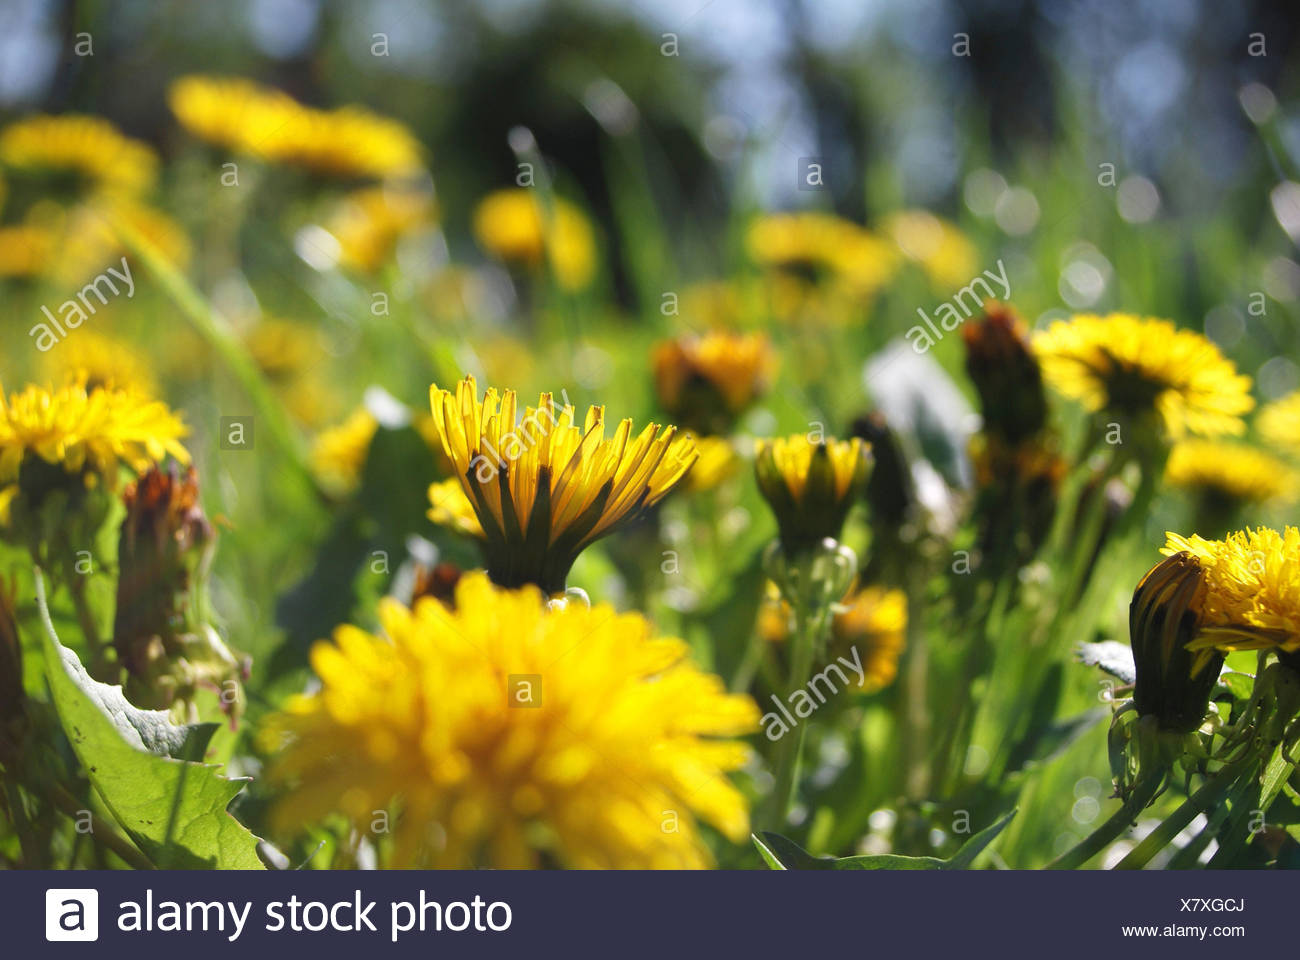 Fiori Gialli Estivi.Flower Meadow Tarassaco Taraxum Officinale Fiorisce Dettaglio